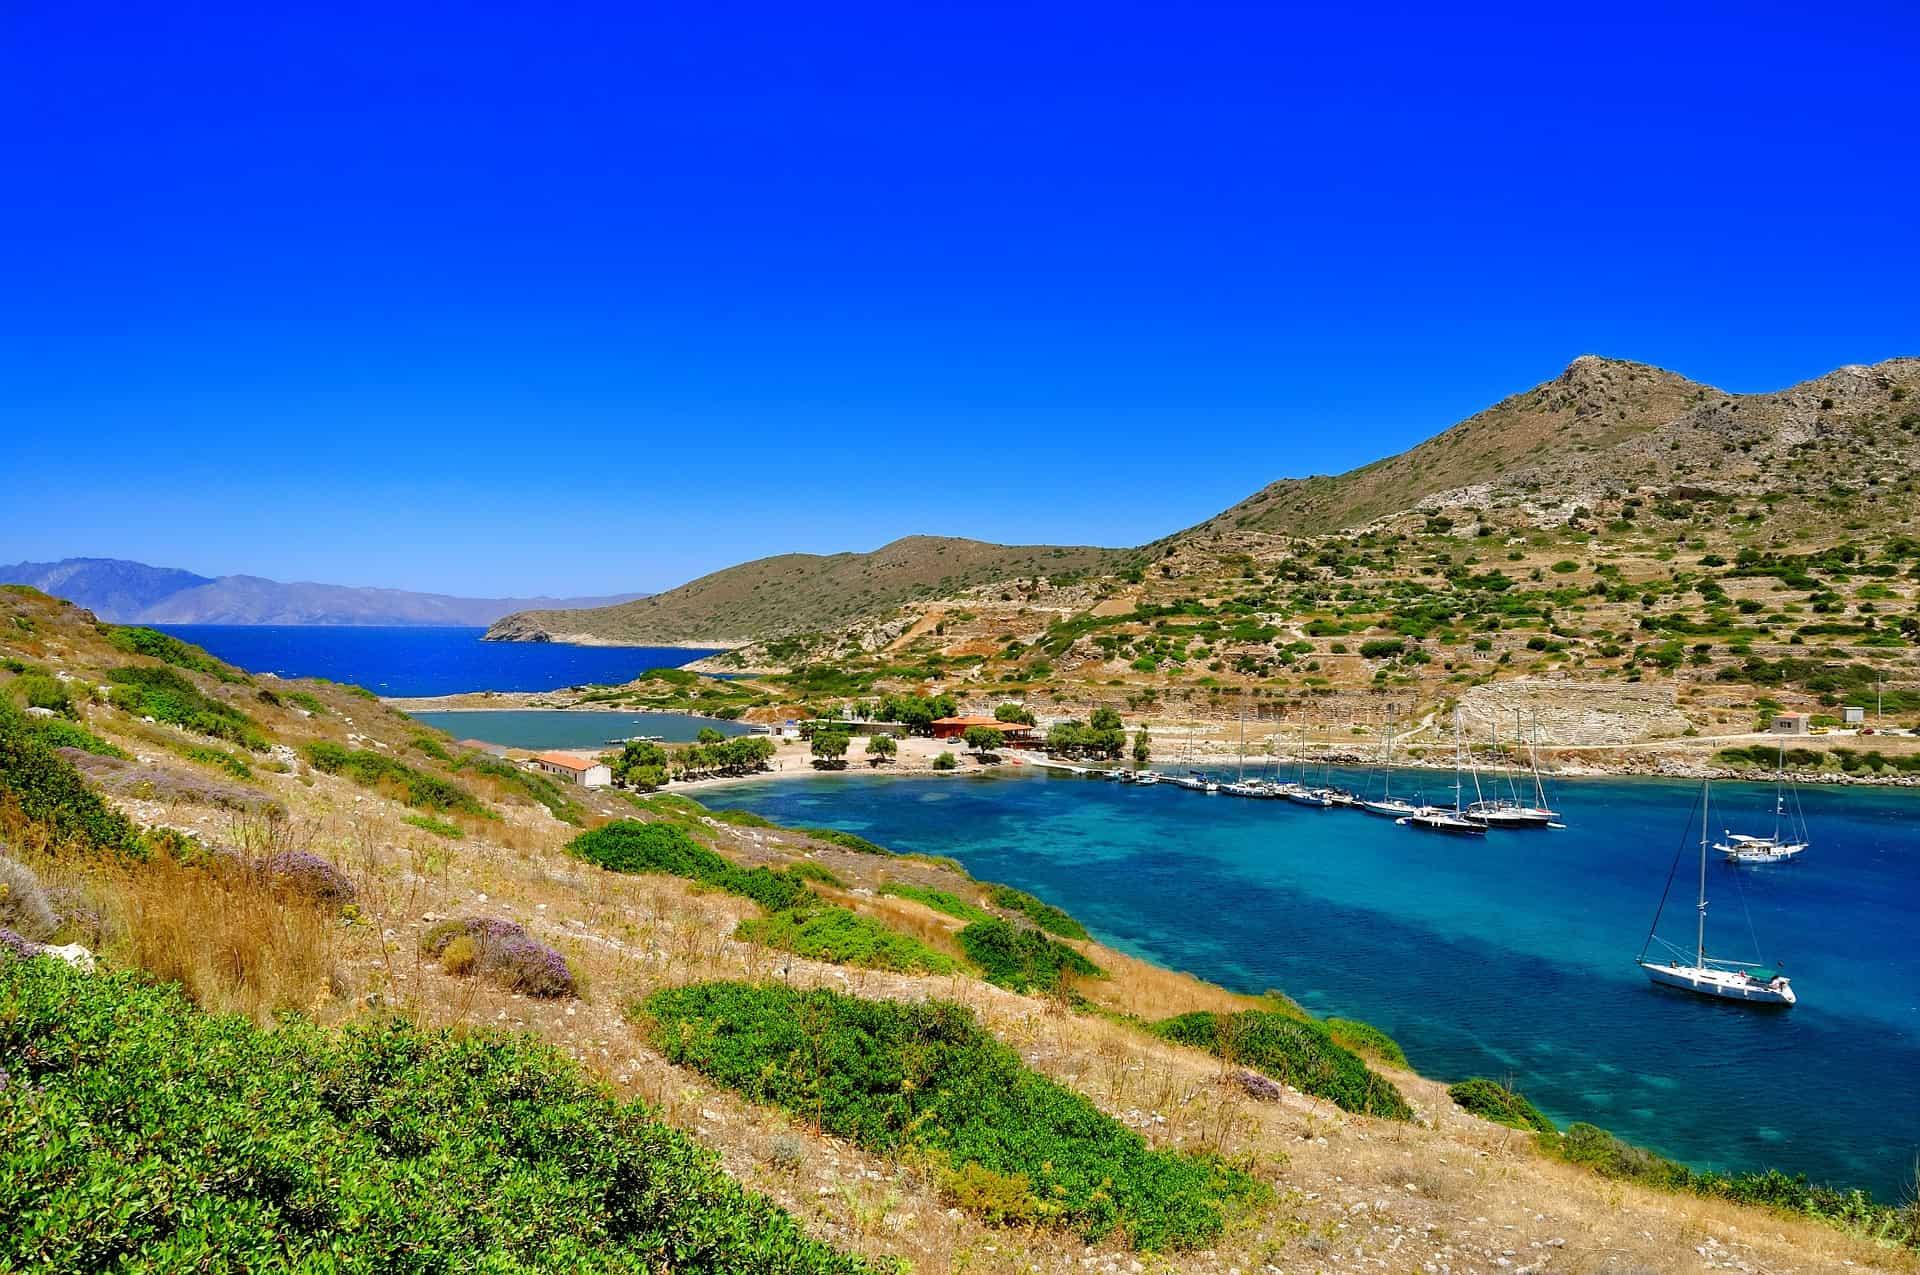 Side Last Minute Deal - 1 Woche nur 208,00€ Türkei Urlaub